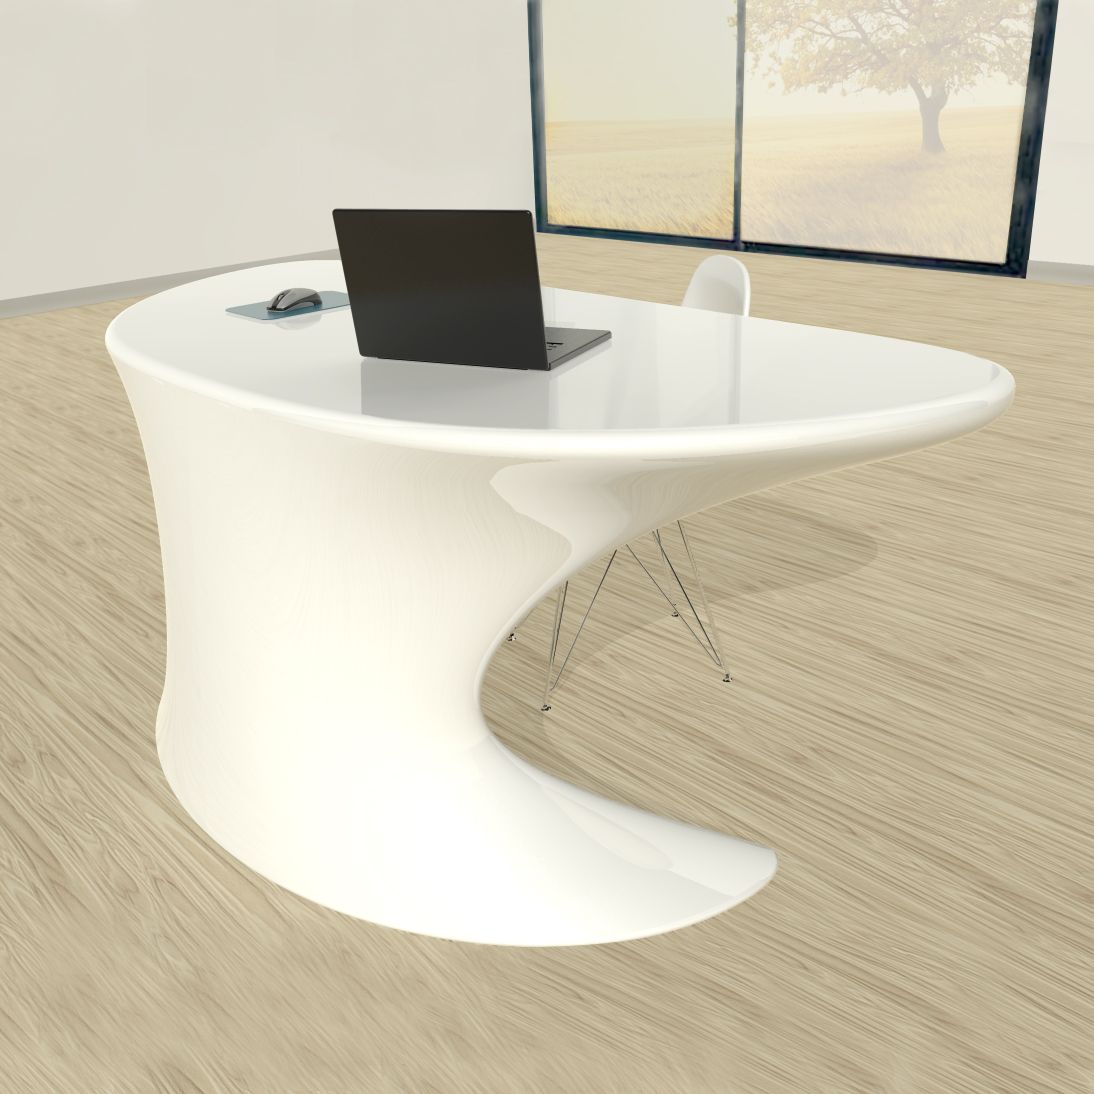 Cobra tavoli e scrivanie zad zone of absolute design for Scrivanie moderne design